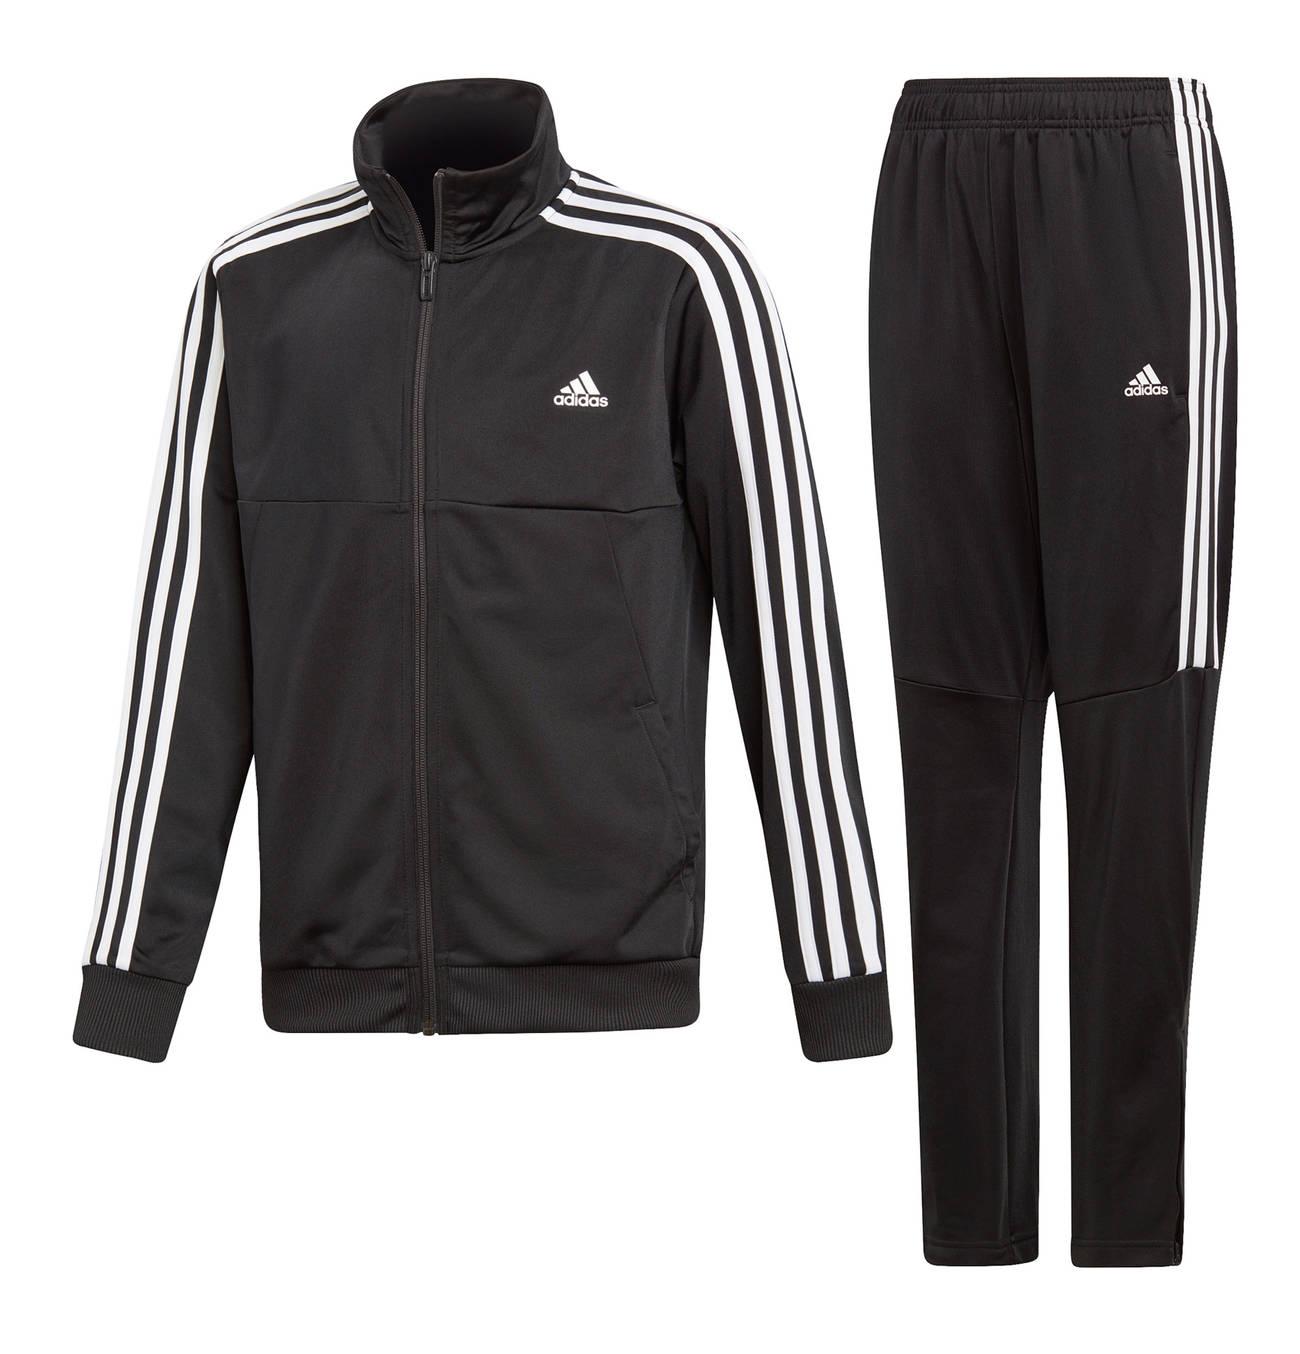 Adidas Tiro 17 Damen Trainingsanzug schwarz weiß